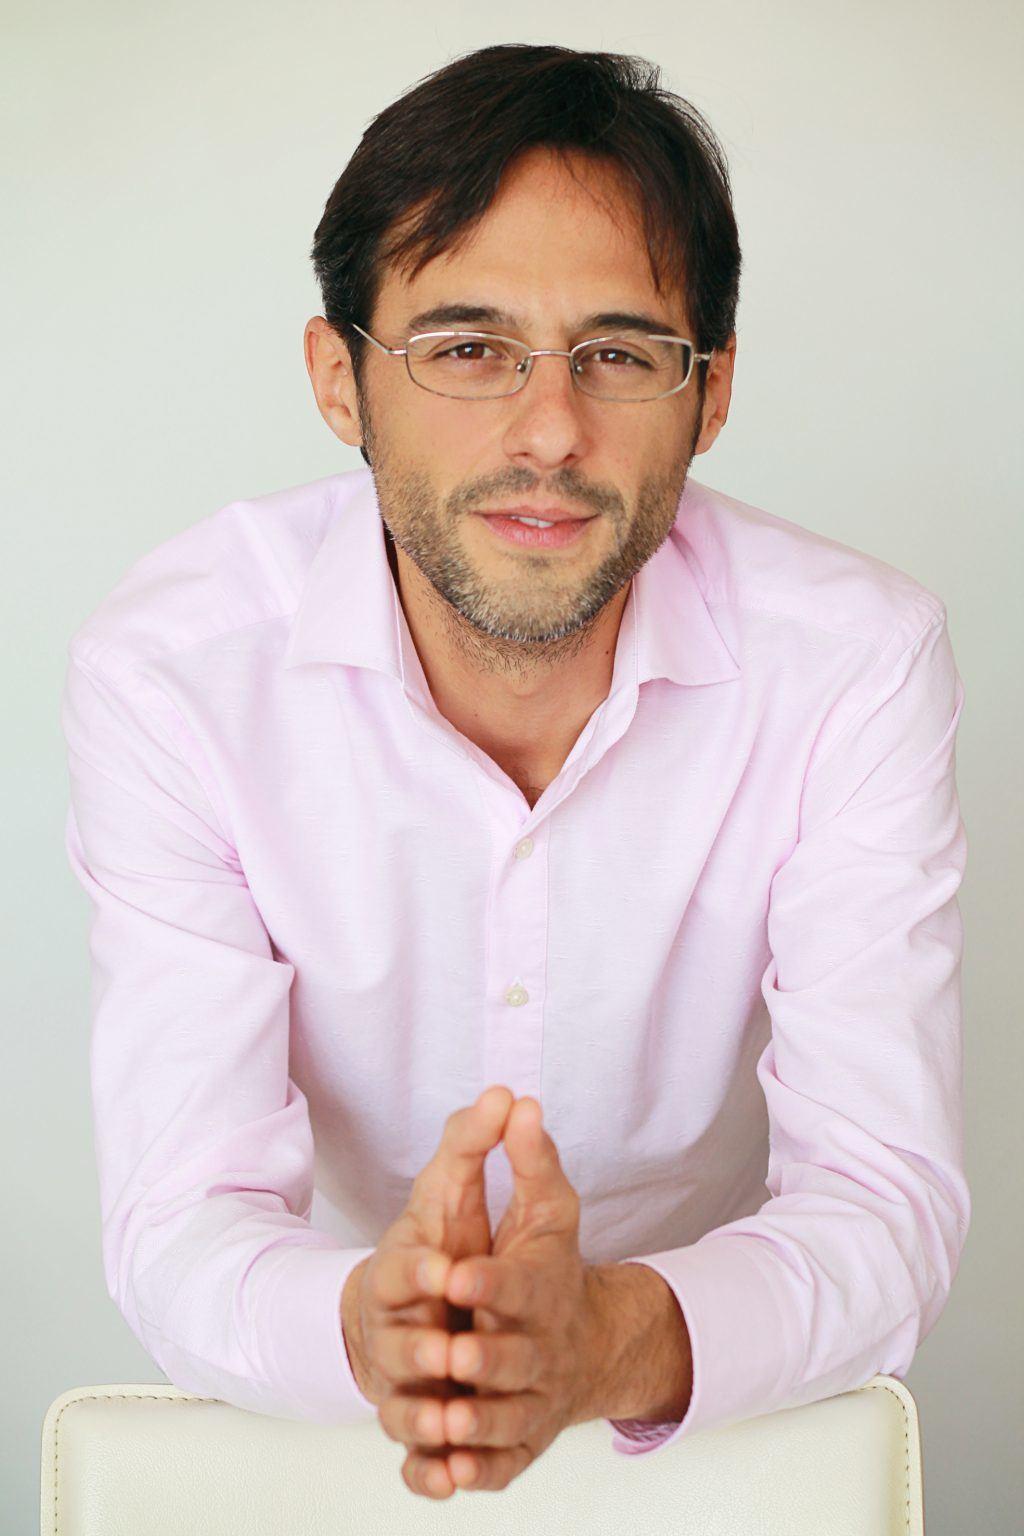 Sergio Fernández - Instituto Pensamiento Positivo